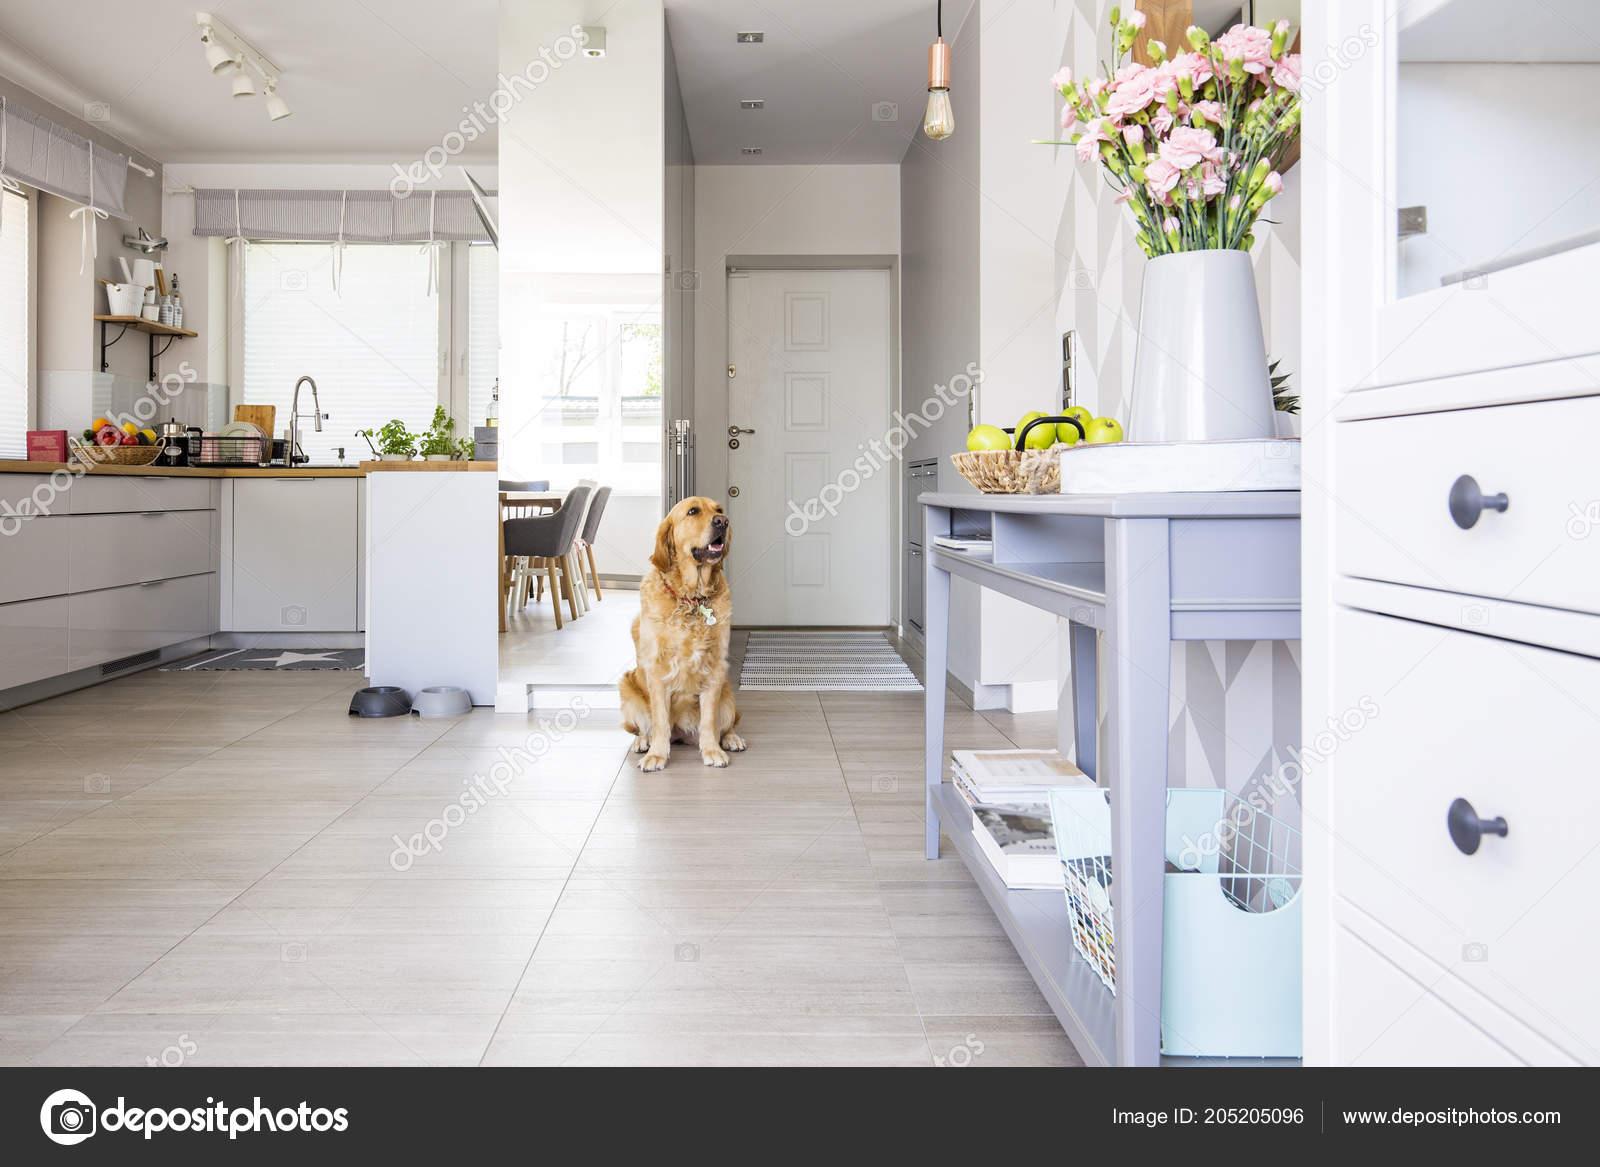 kitchen console table rolling chairs 快乐的狗坐在露天厨房内部的真实照片与鲜花和绿色的苹果放置在蓝色控制台 快乐的狗坐在露天厨房内部的真实照片与鲜花和绿色的苹果放置在蓝色控制台表 照片作者photographee eu